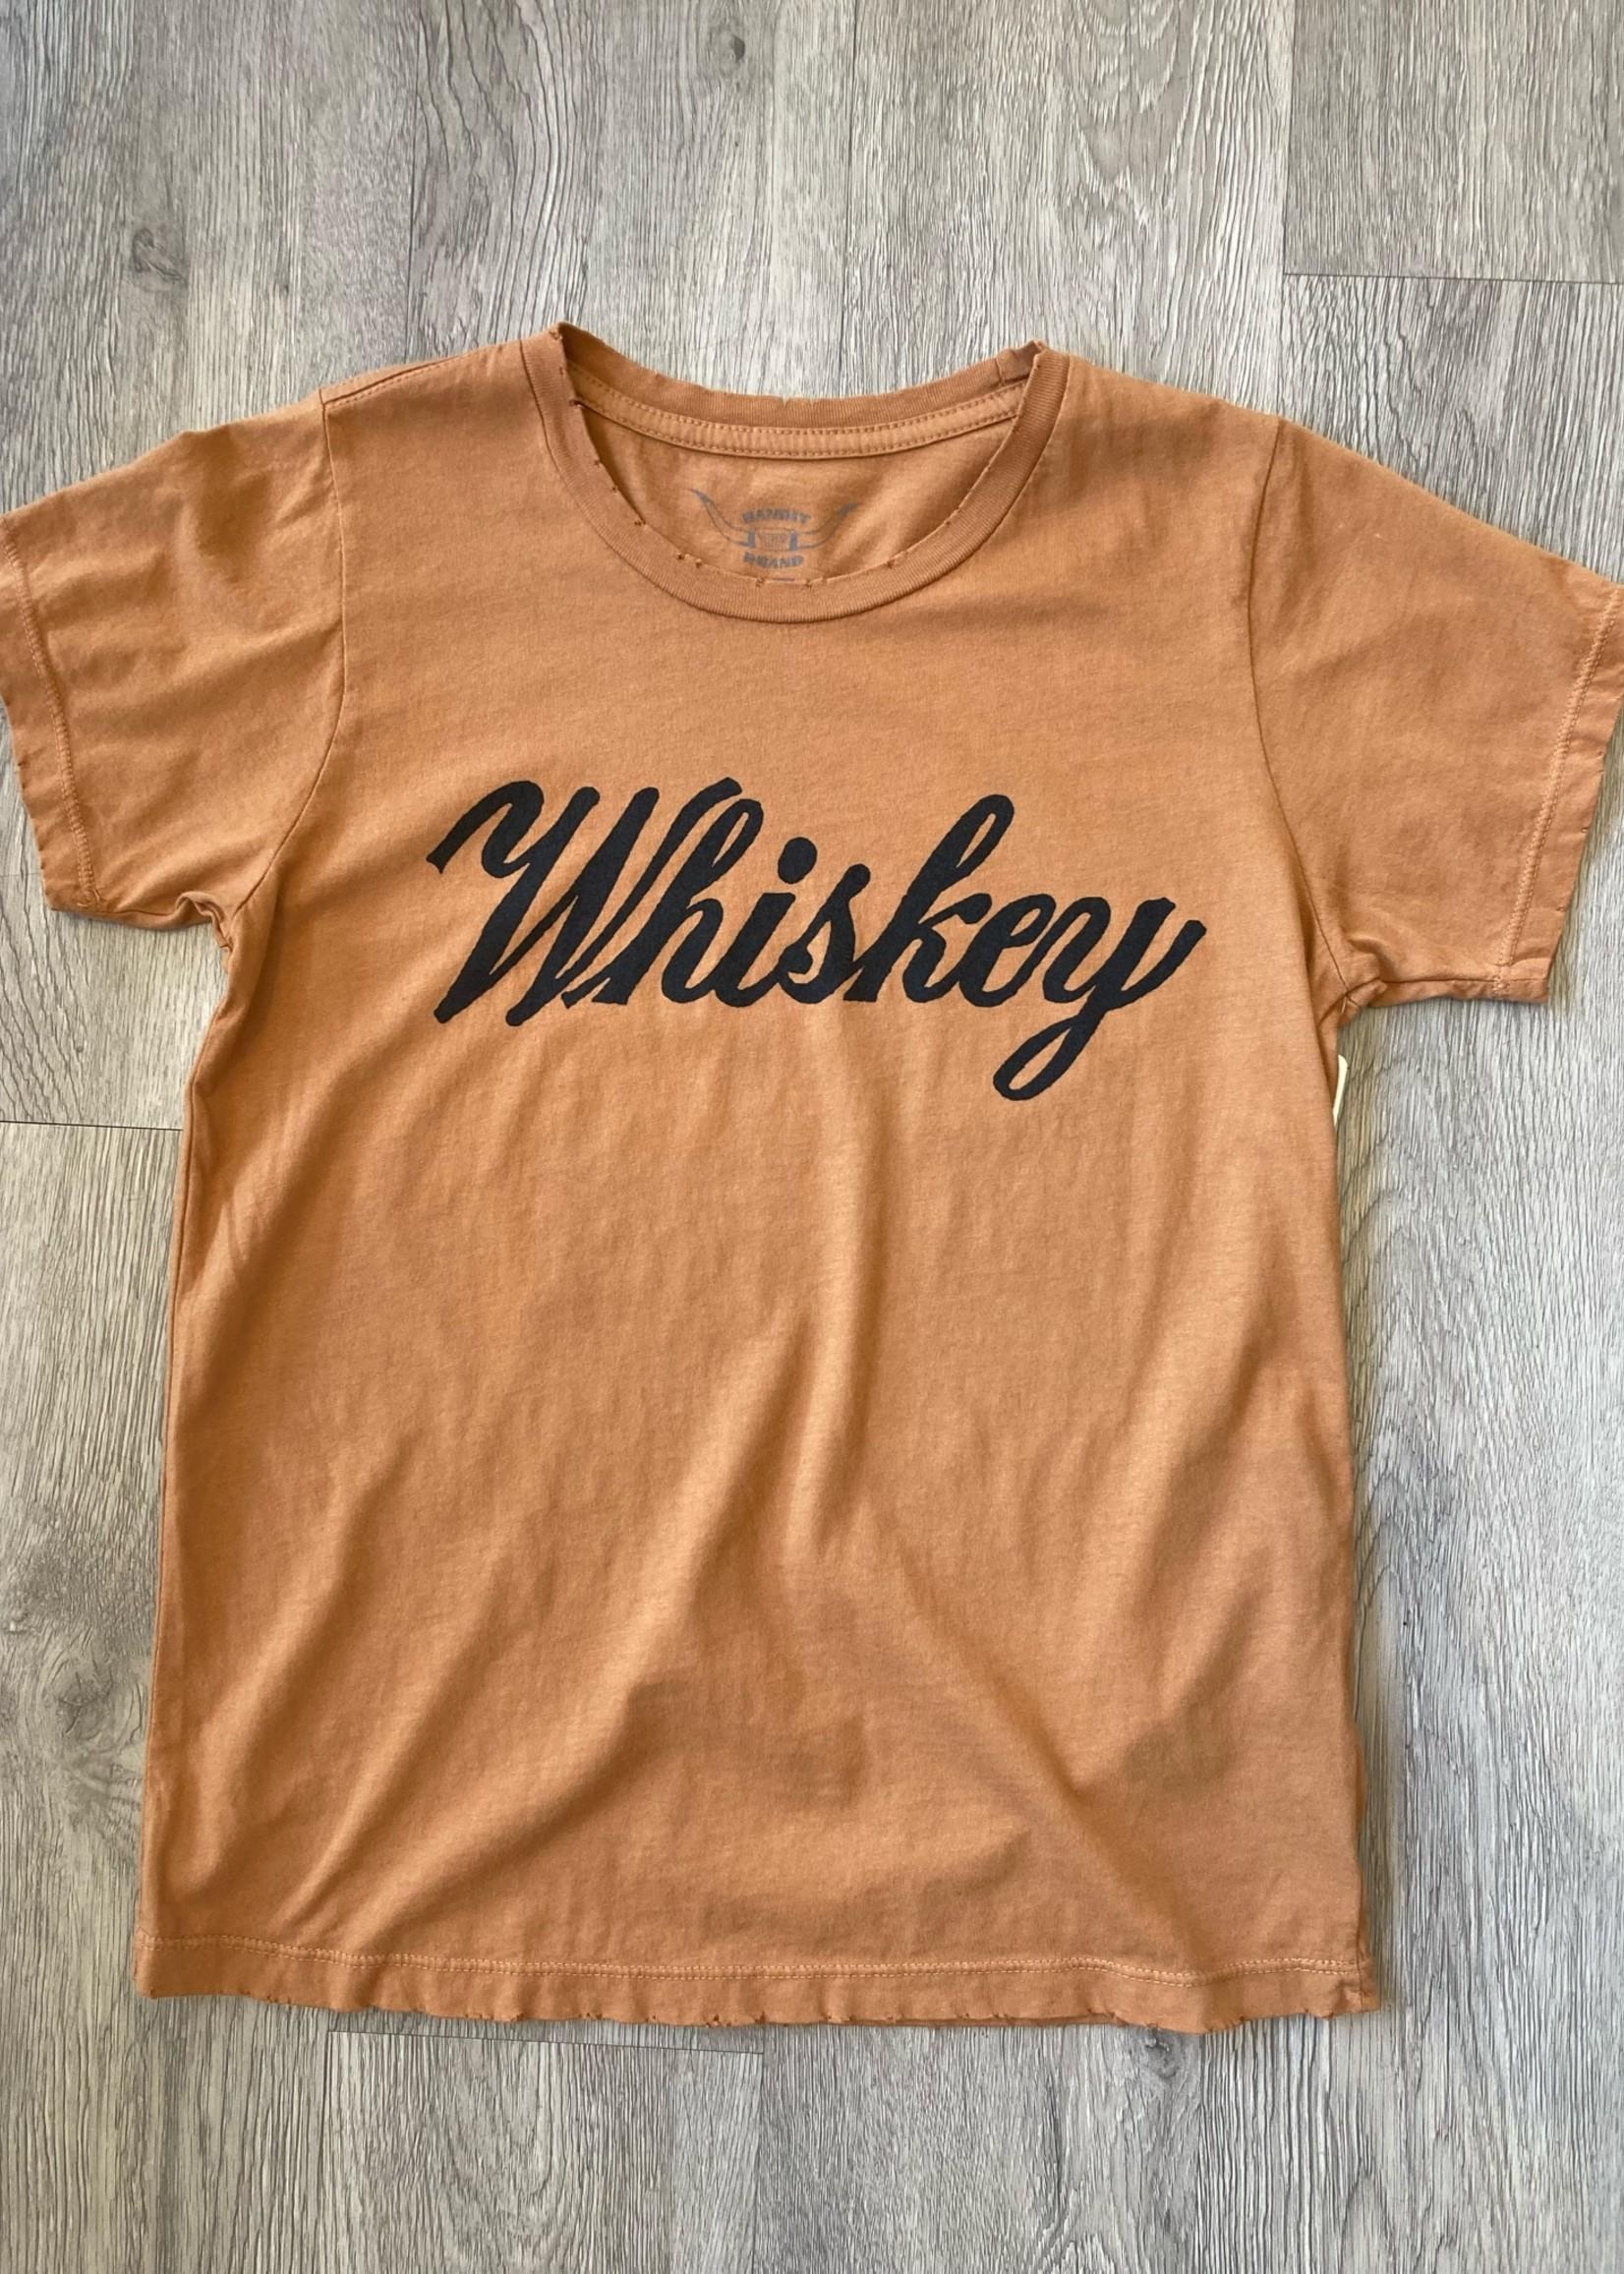 bandit brand bandit brand whiskey tee